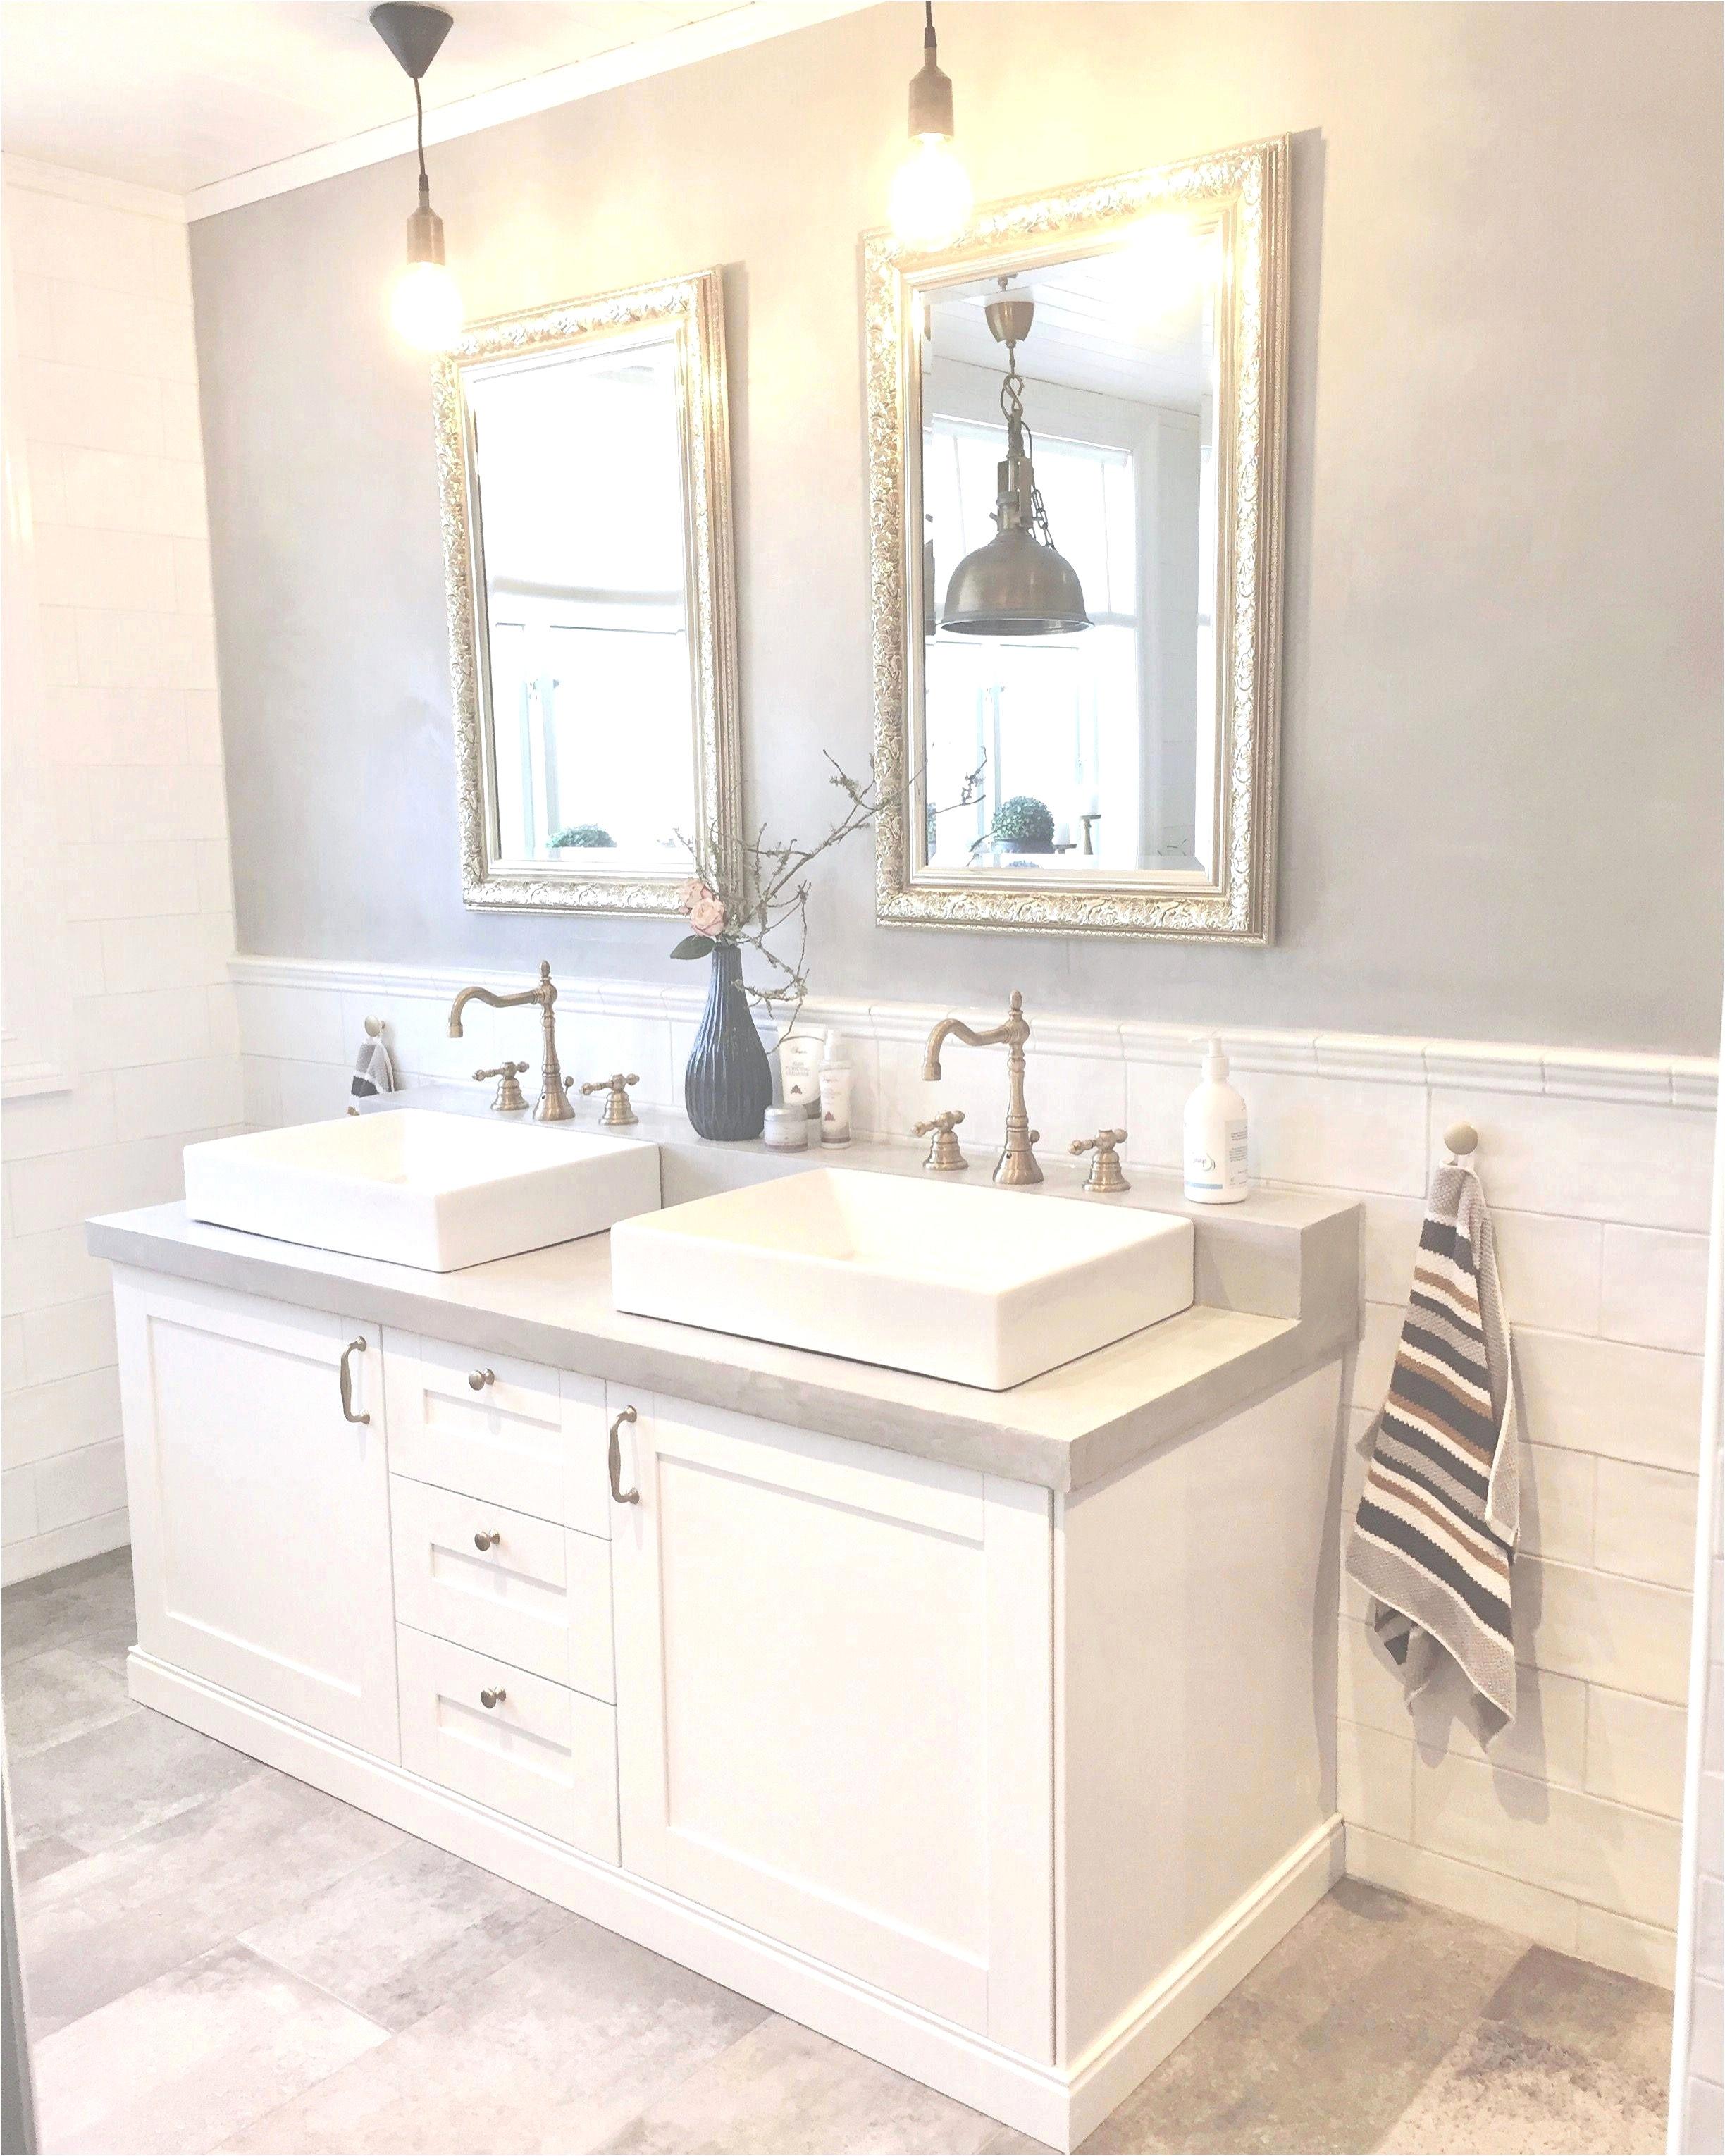 bathtub skins best of bathtub liners beautiful image bathroom slideshow 2 bath fitter pany